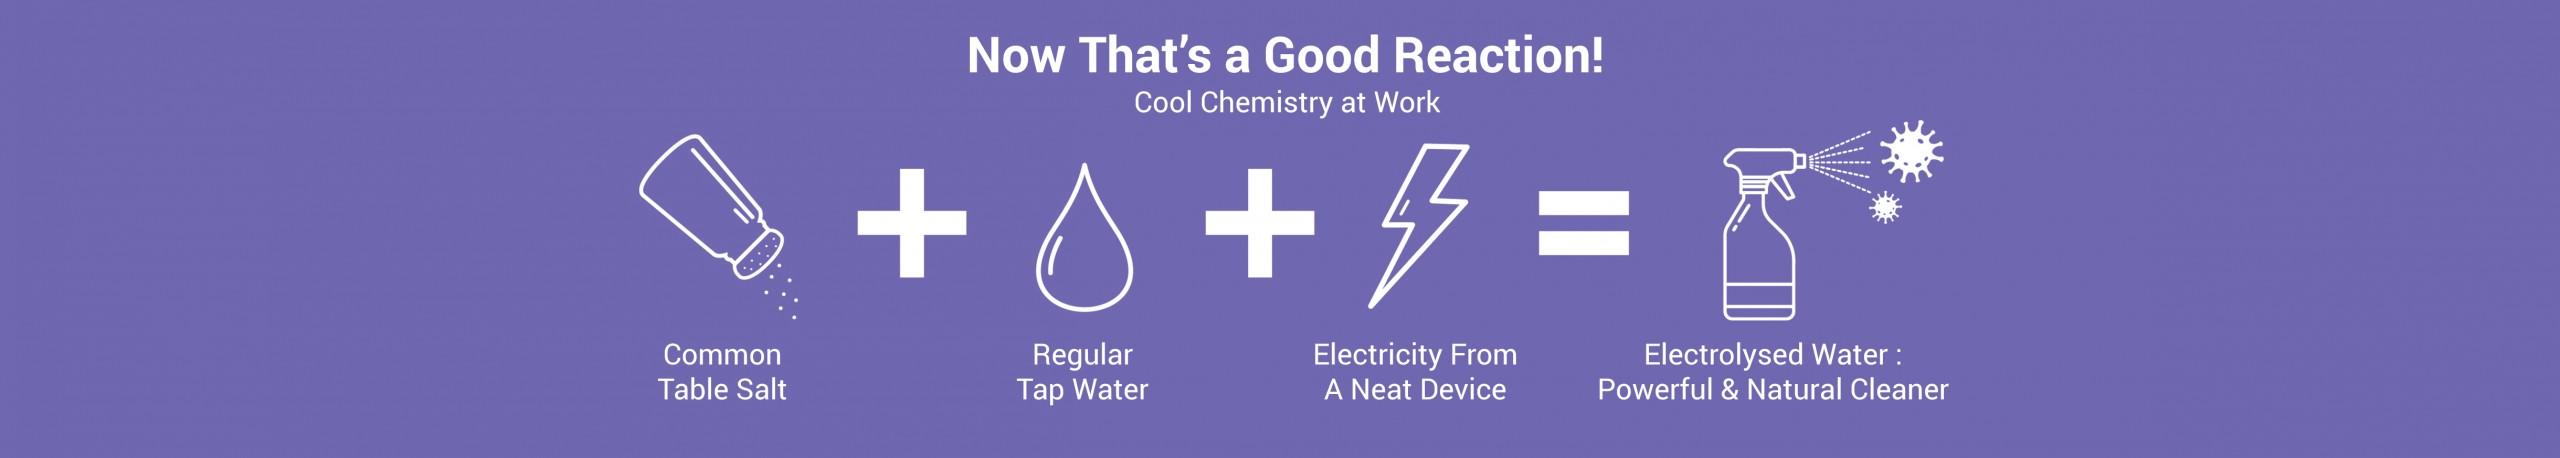 Cool Chemistry